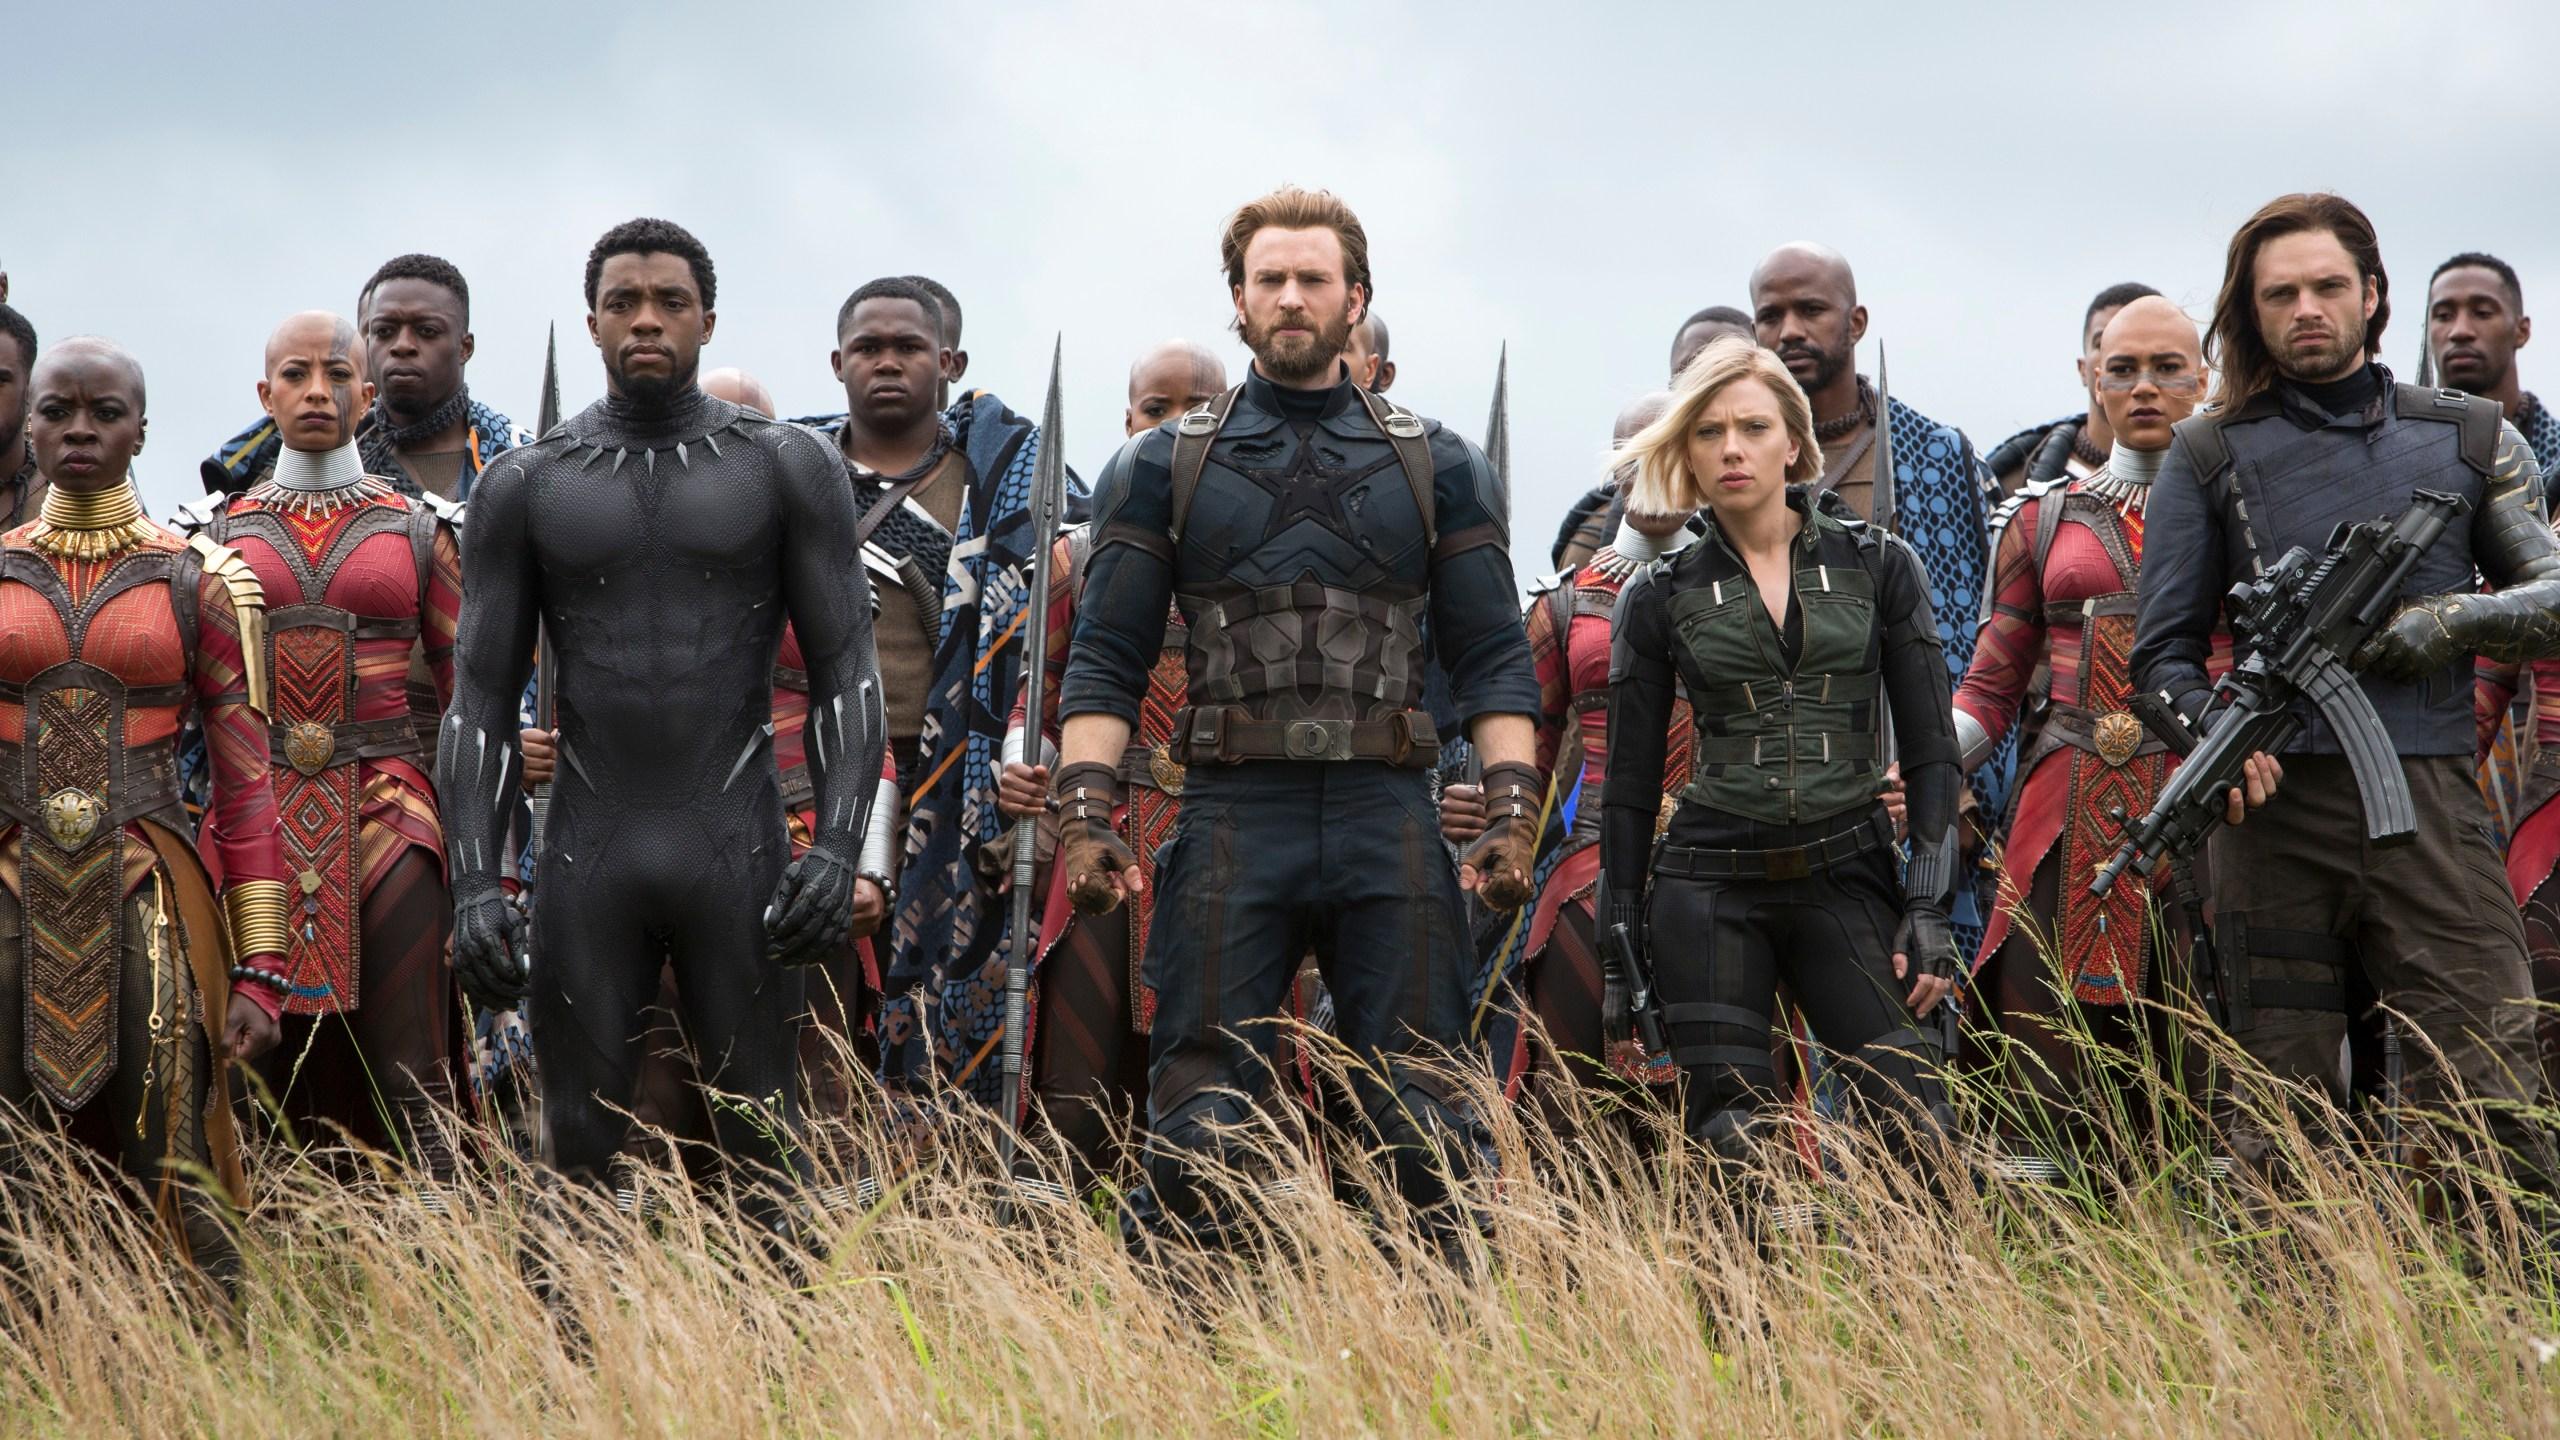 Film_Review_Avengers_Infinity_War_39989-159532.jpg13071424